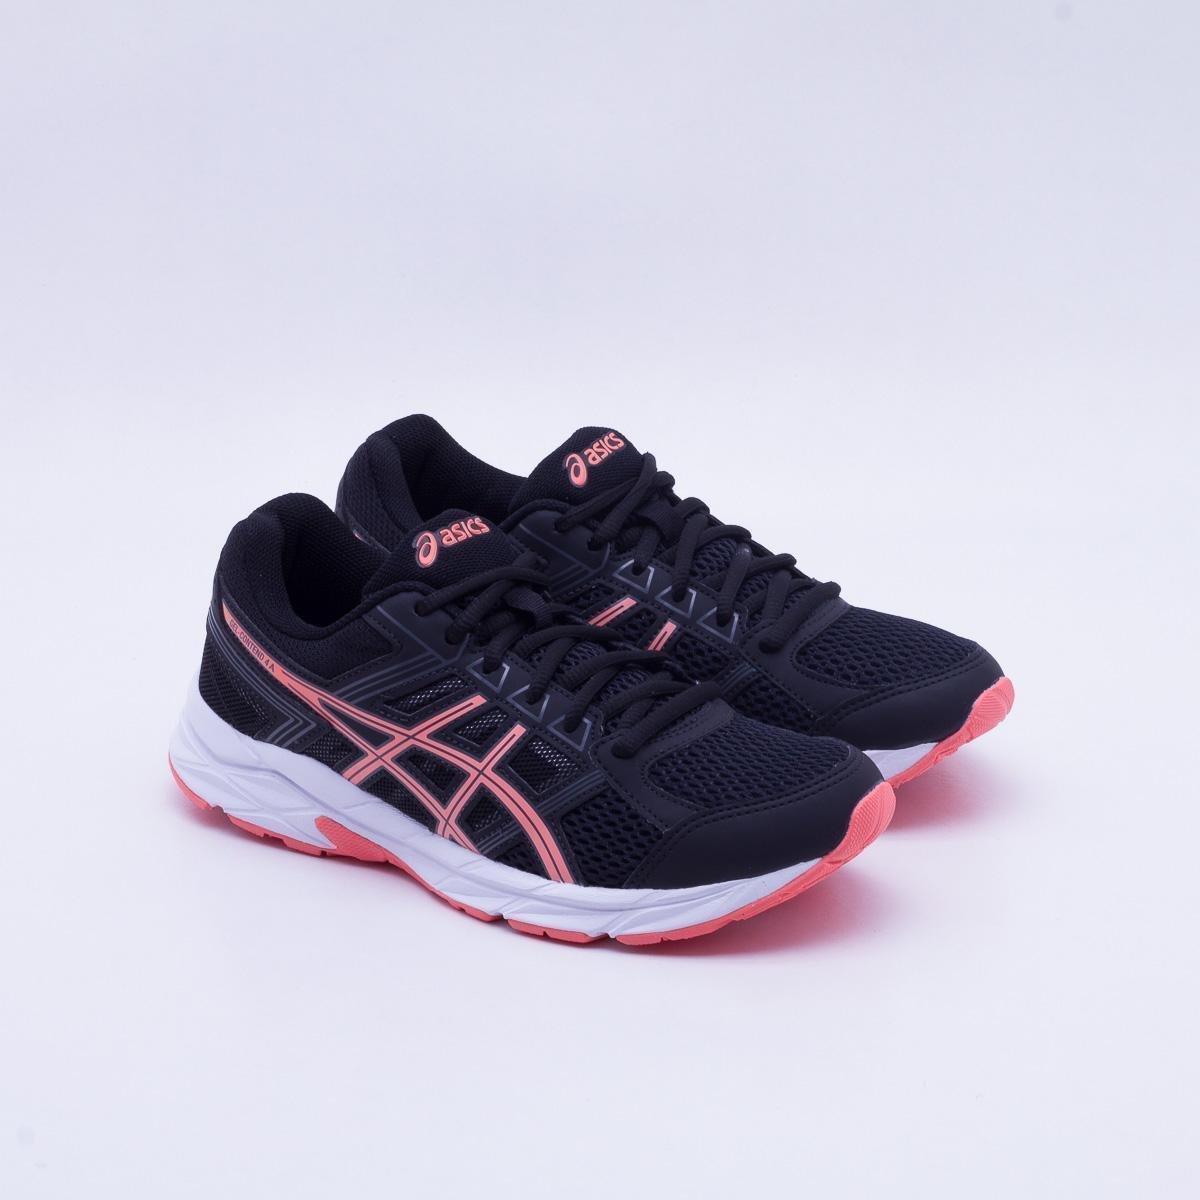 mizuno womens volleyball shoes size 8 x 1 junio qatar